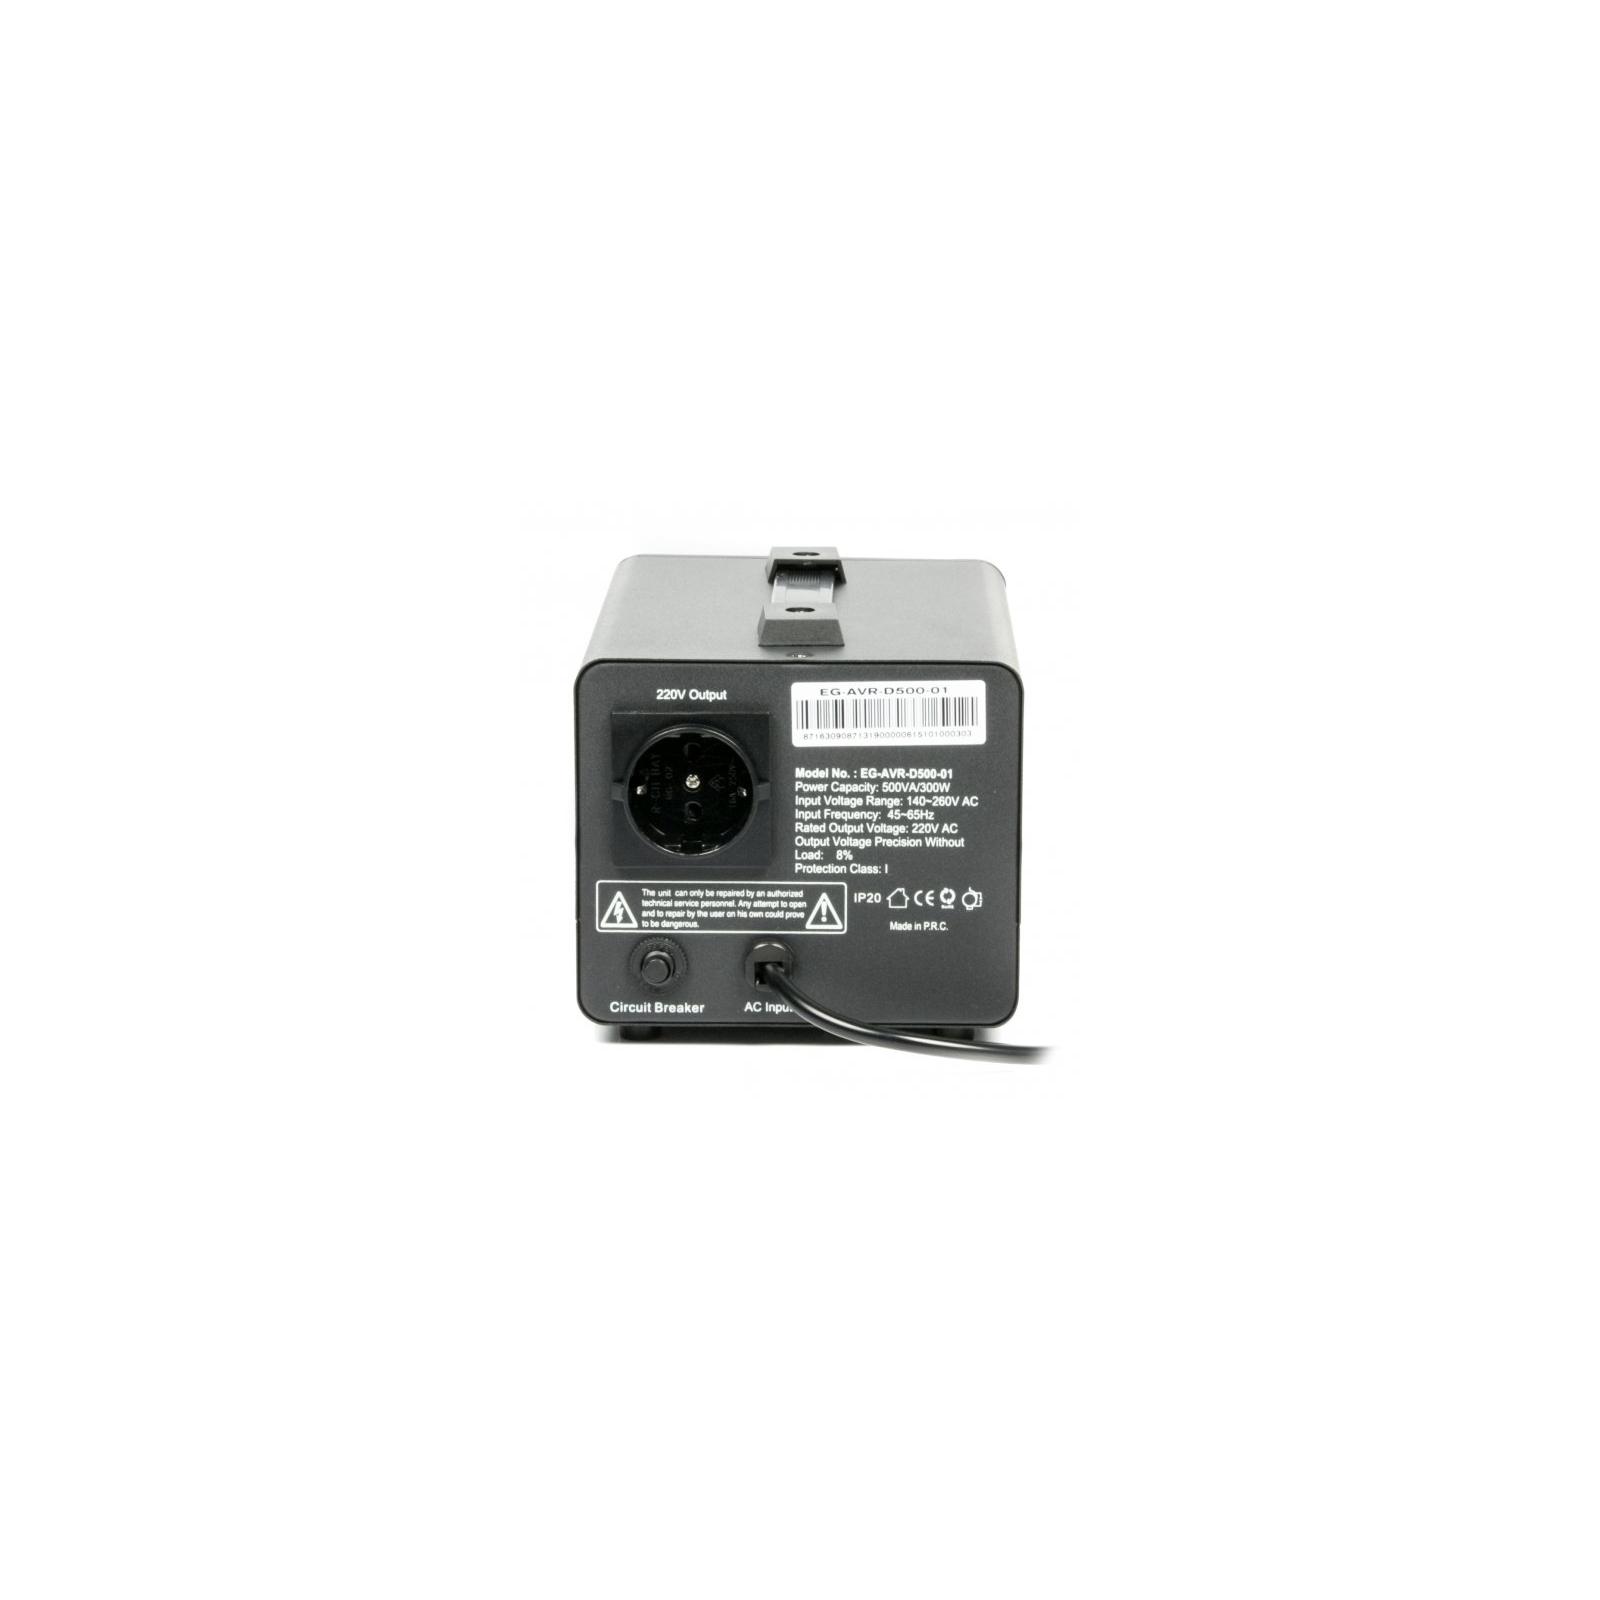 Стабилизатор EnerGenie EG-AVR-D500-01, 300Вт (EG-AVR-D500-01) изображение 2